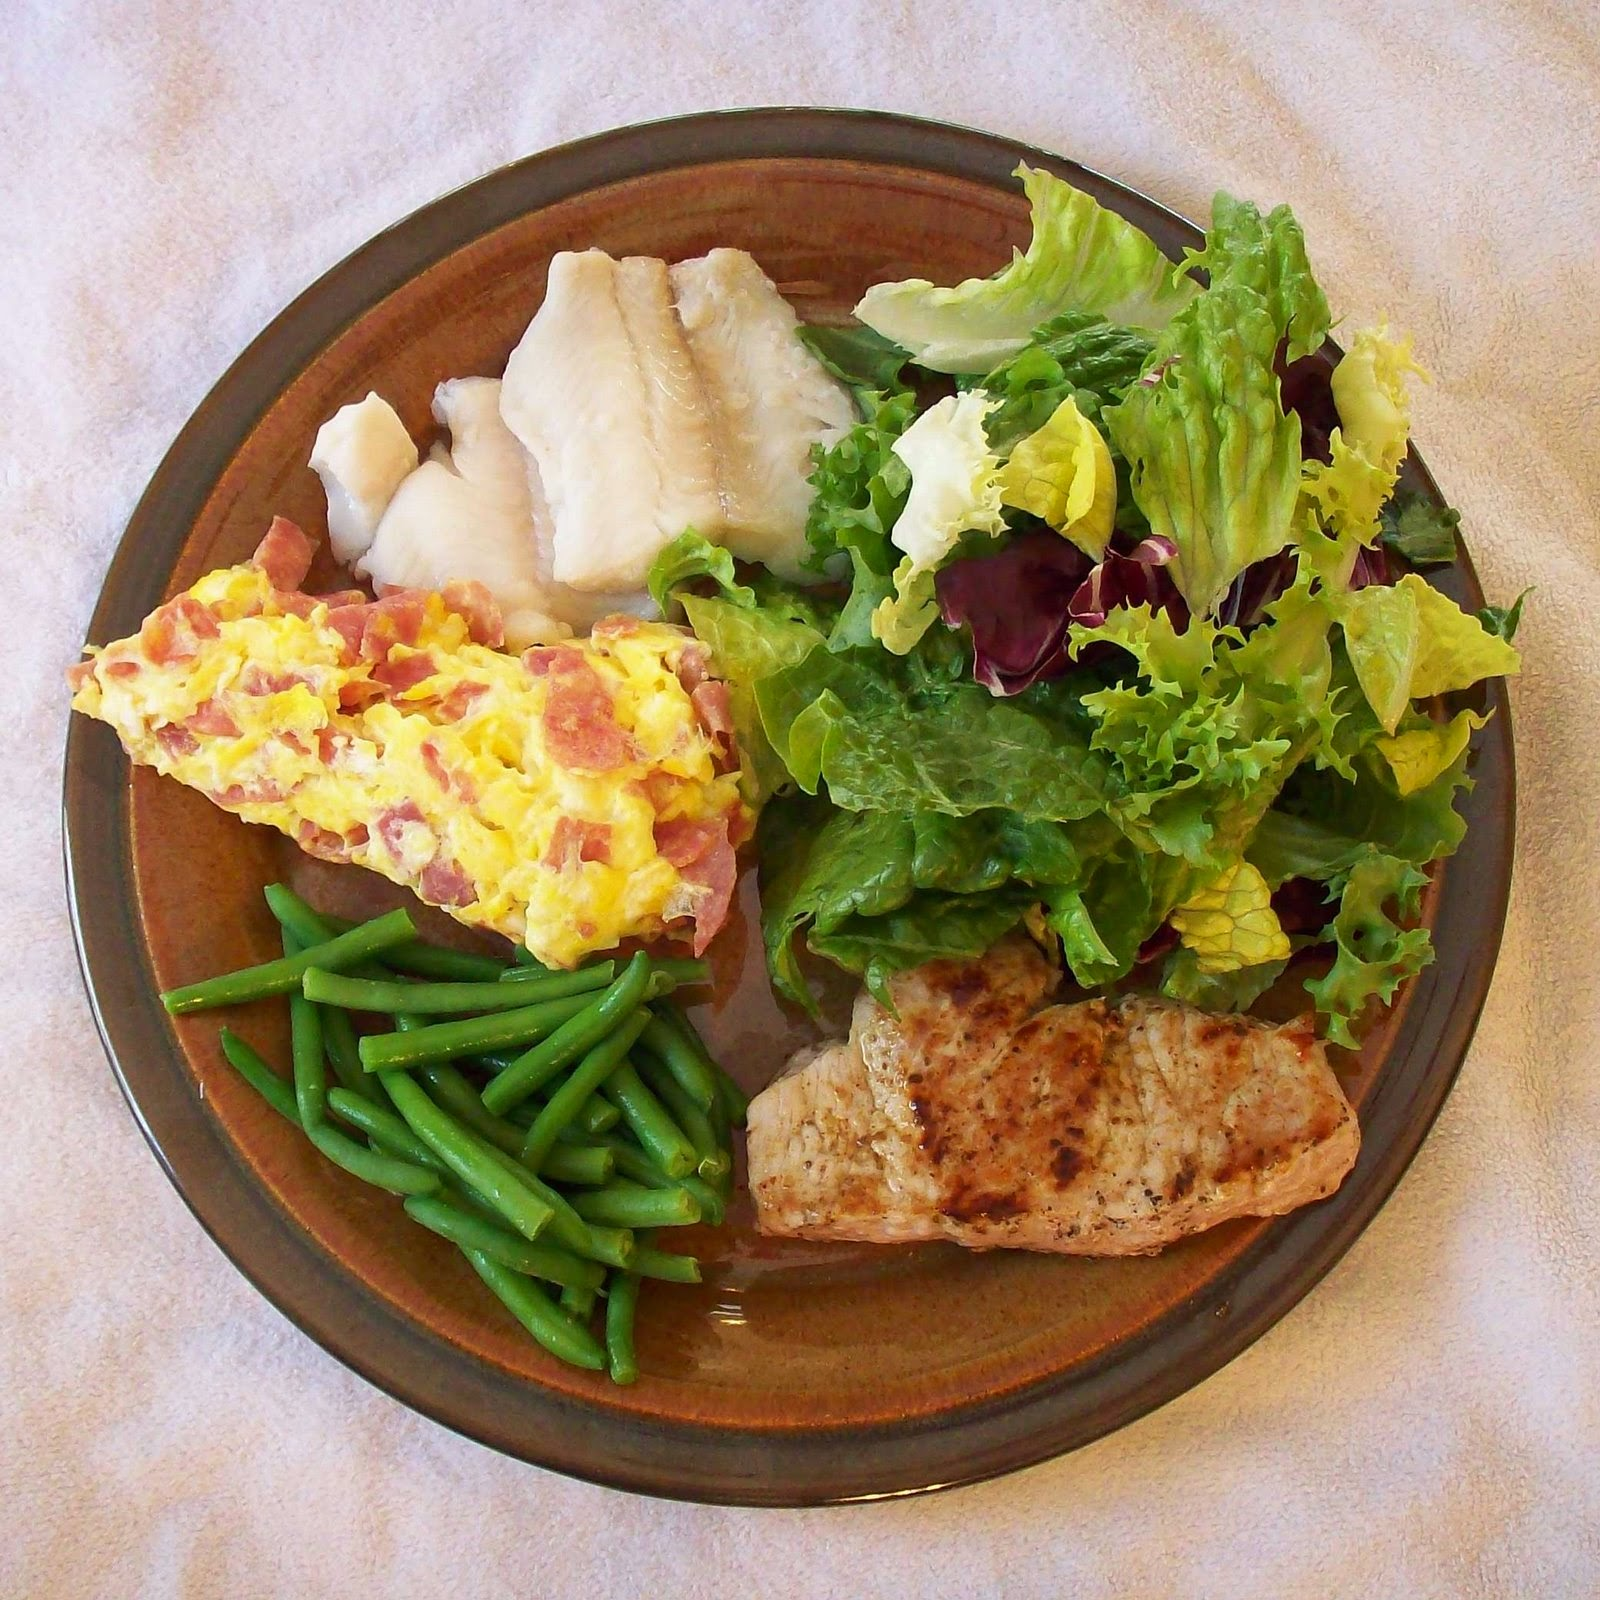 http://mariasols.com/2008/02/03/kimkins-diet-plans/